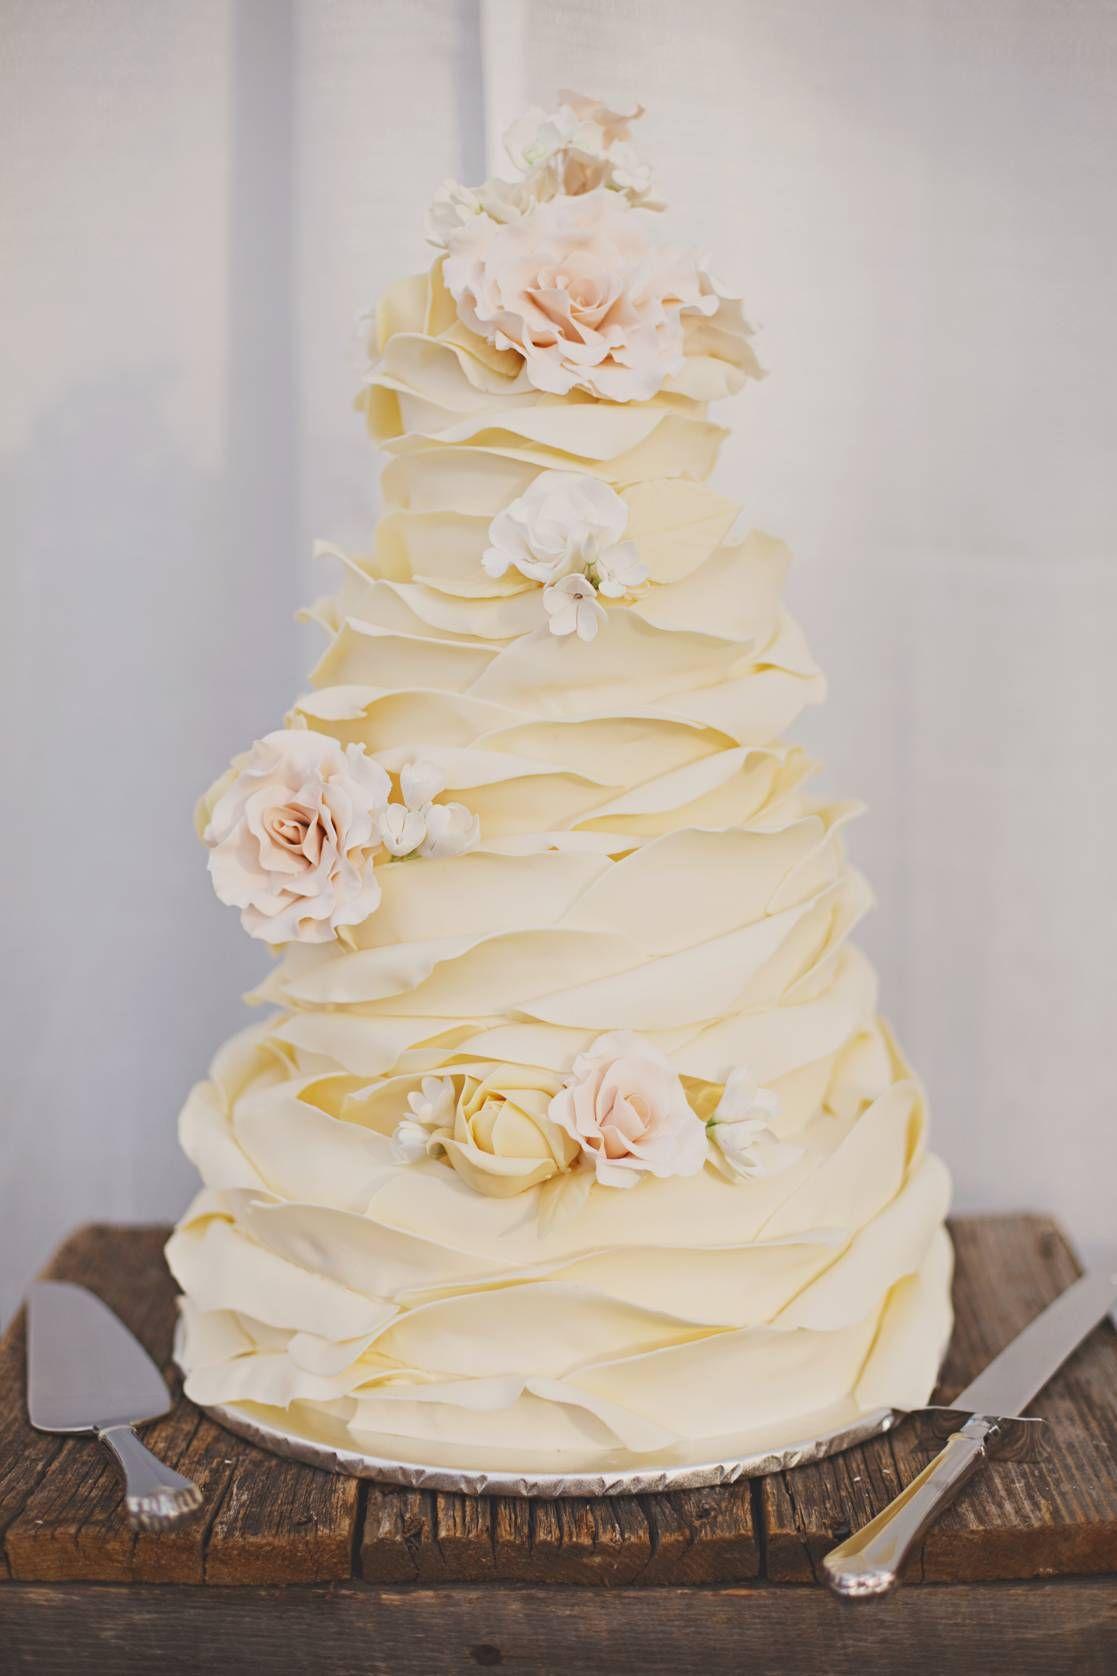 Wedding Cake By The Art Of Cake Edmonton Alberta Theartofcake Whimsical Wedding Cakes Wedding Cake Dessert Table Wedding Cakes